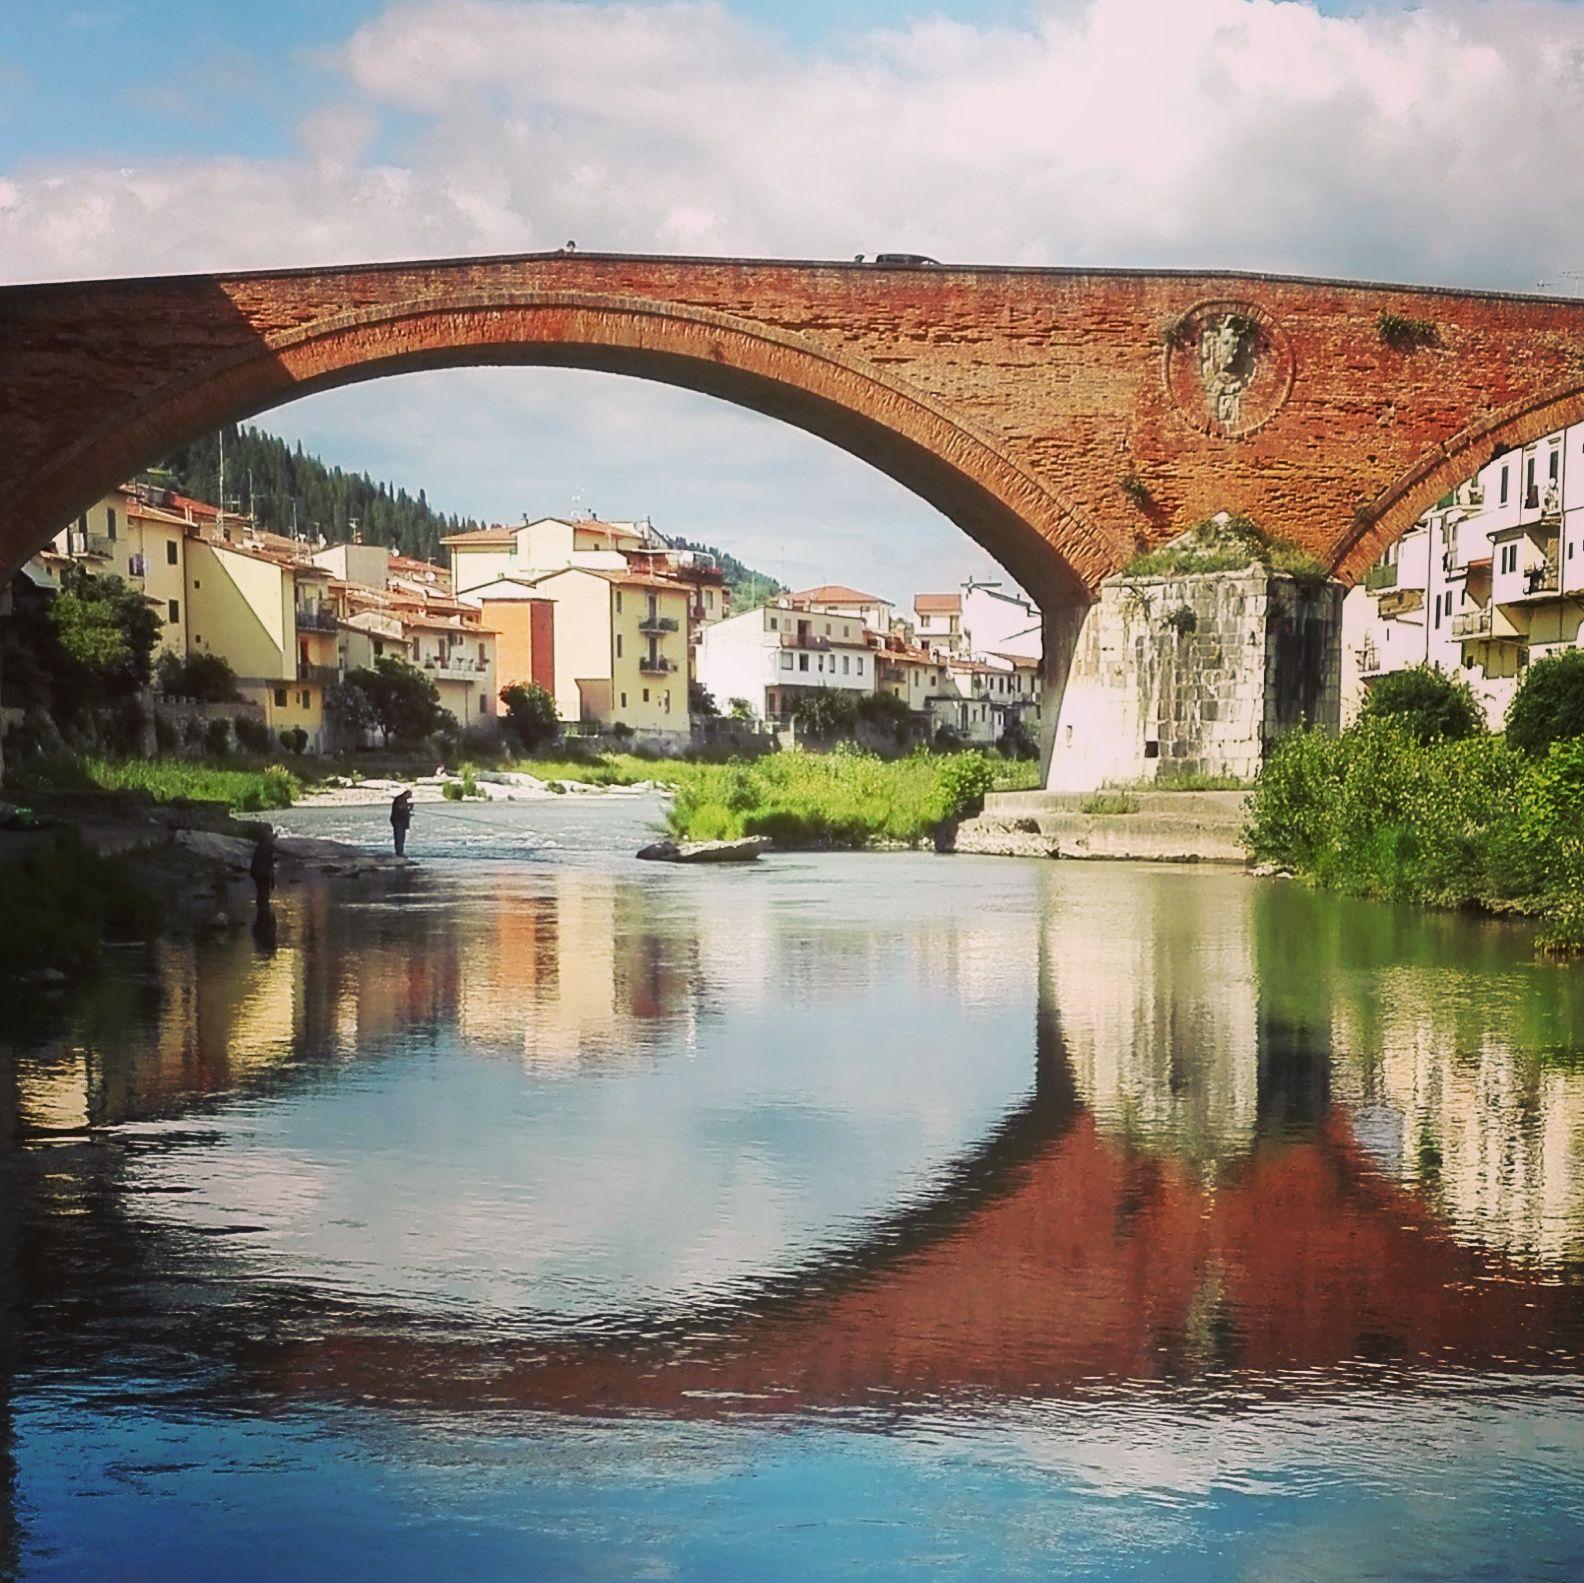 Pontassieve - Tracce di nobiltà tra Arno e Sieve - Toscana Ovunque Bella